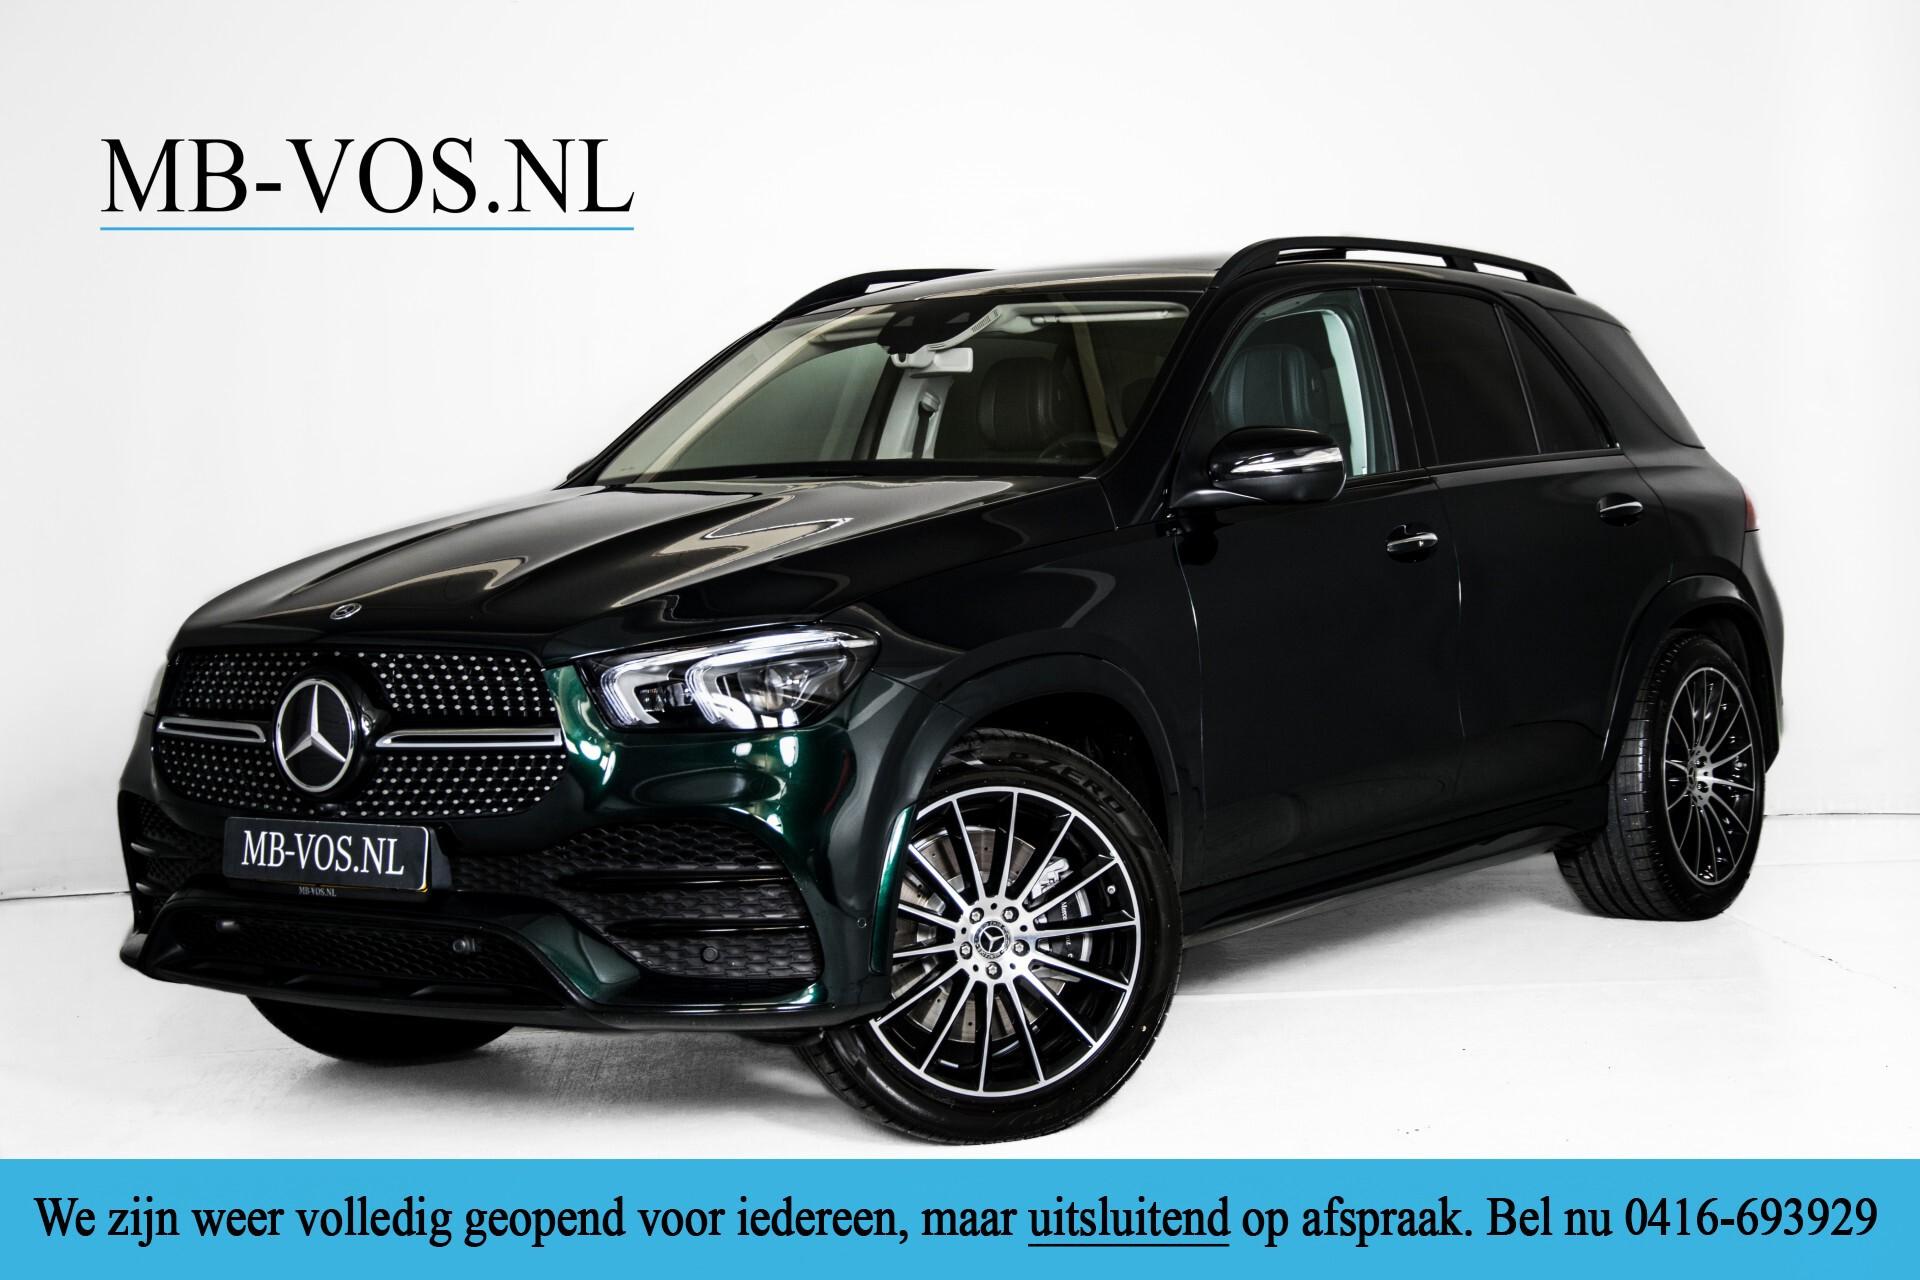 Mercedes-Benz GLE 450 4-M 7-Persoons AMG Massage/Rij-assist/Keyless/TV/360/Night/Trekhaak Aut9 Foto 1